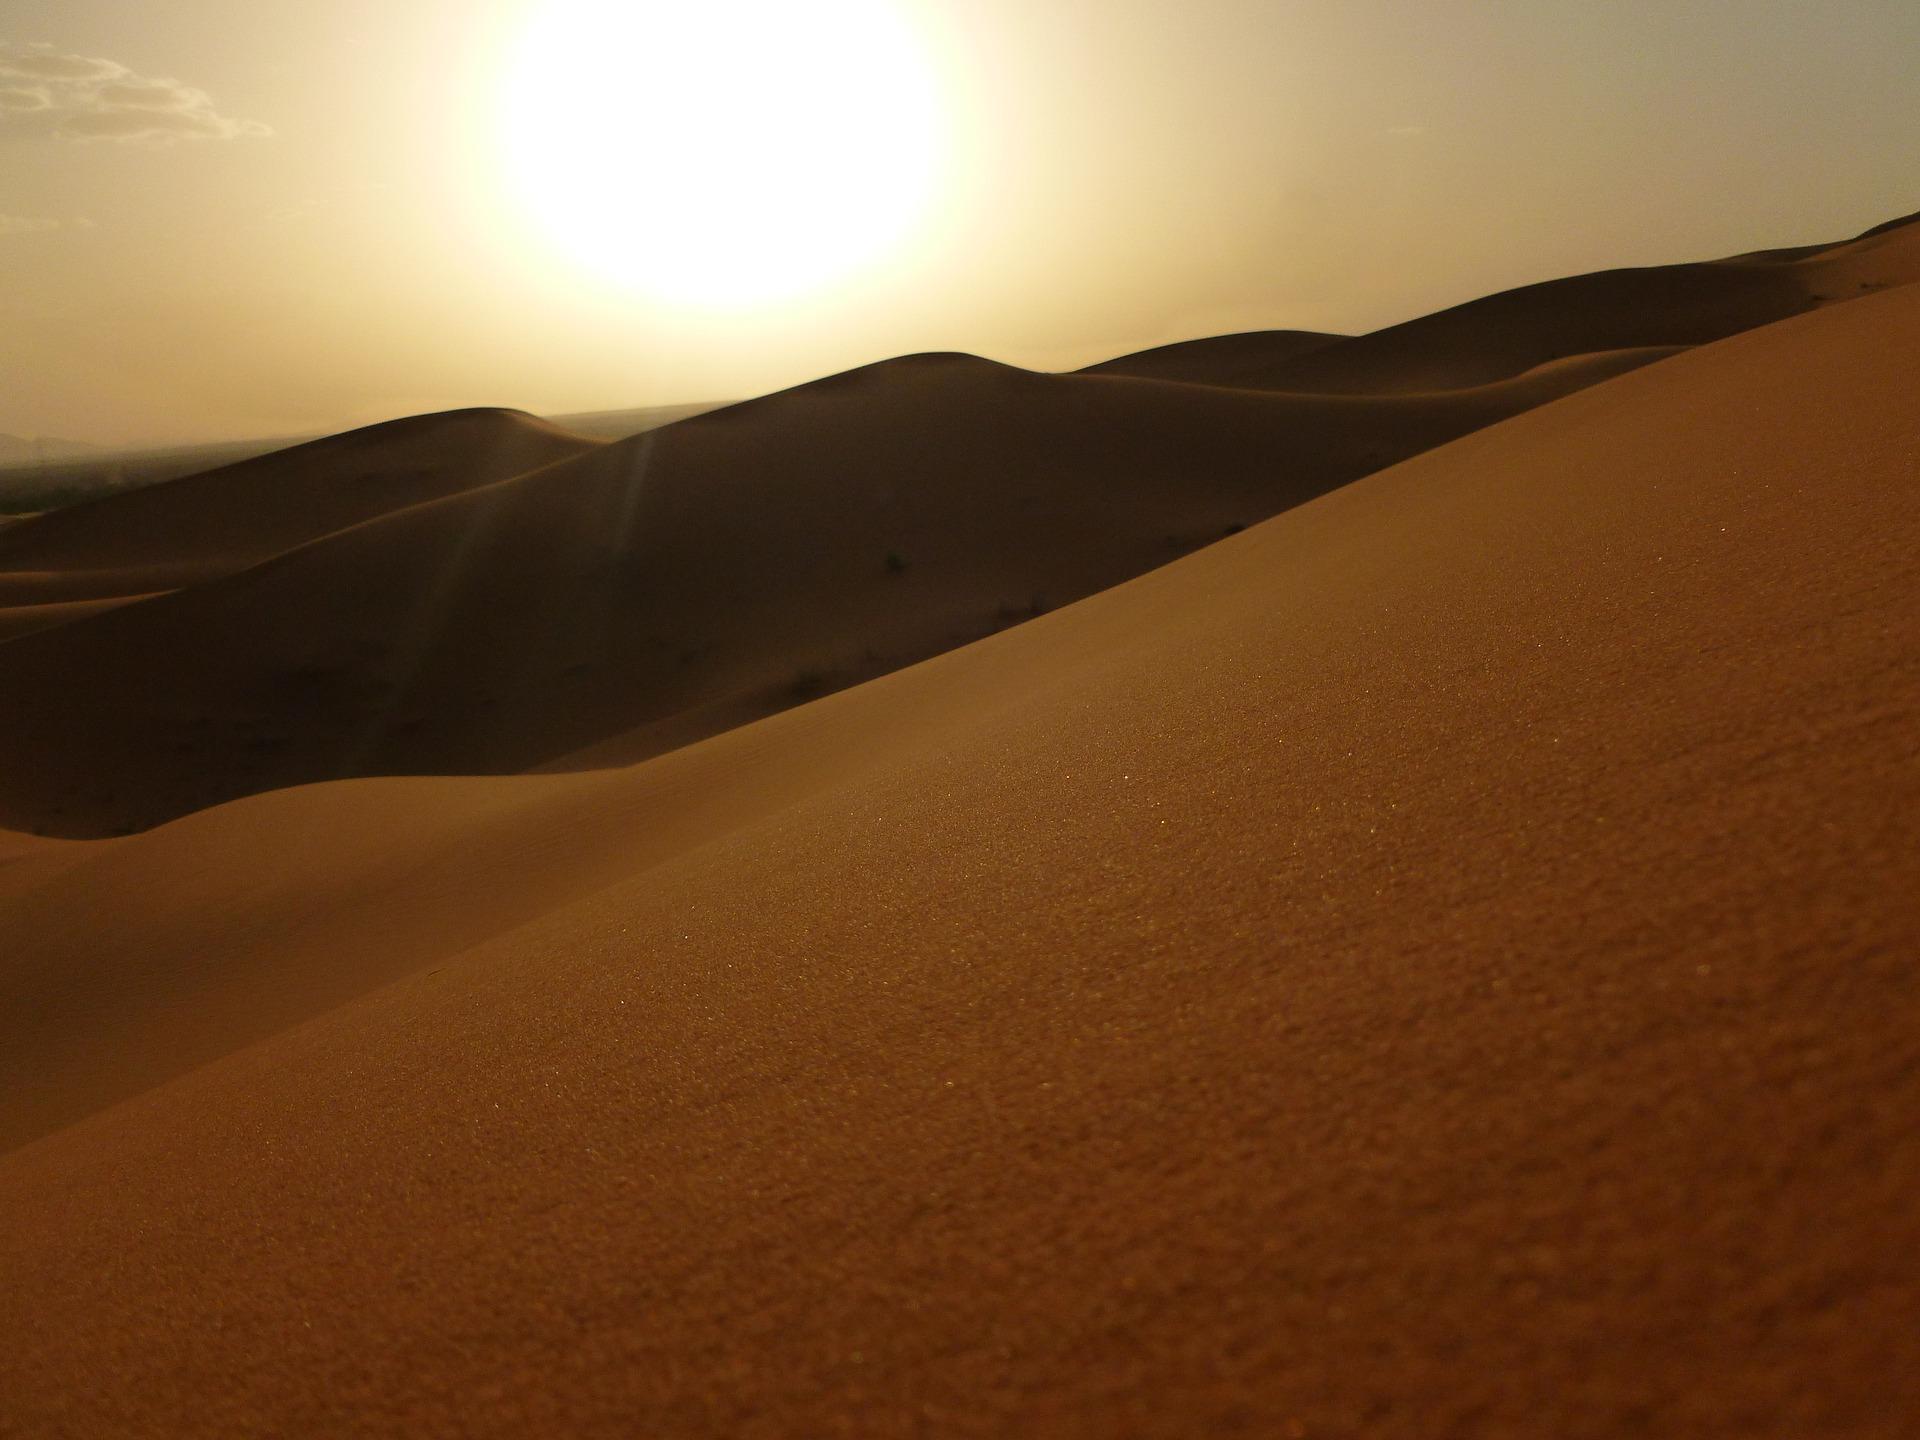 Maroc - Dune de l'Erg chebbi